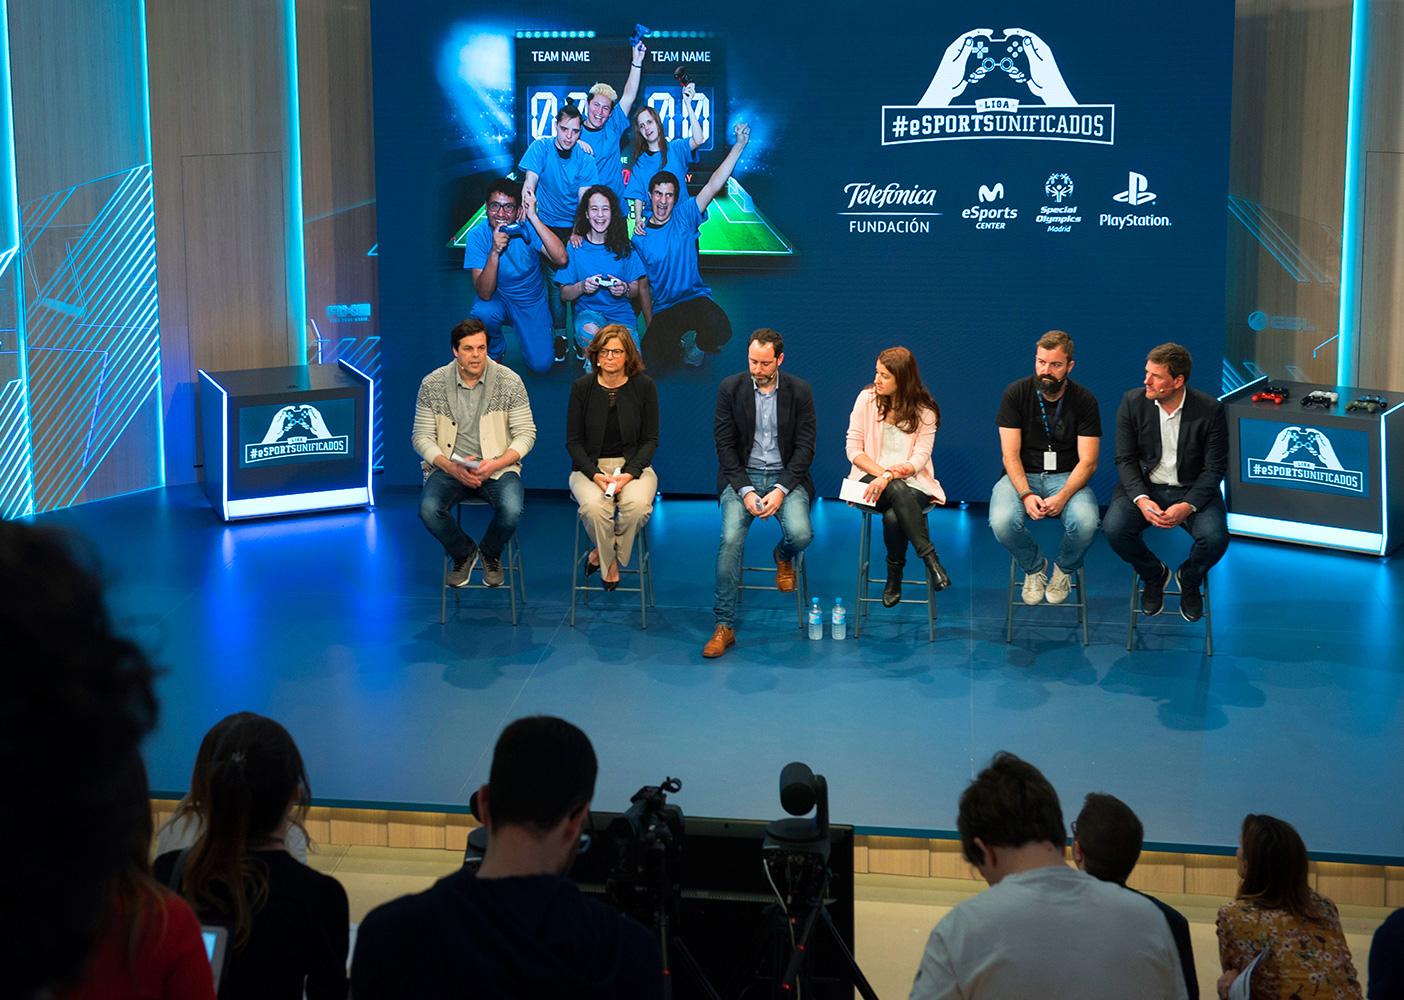 http://www.idgtv.es/archivos/201805/i-campeonato-esports-unificados-img2.jpg